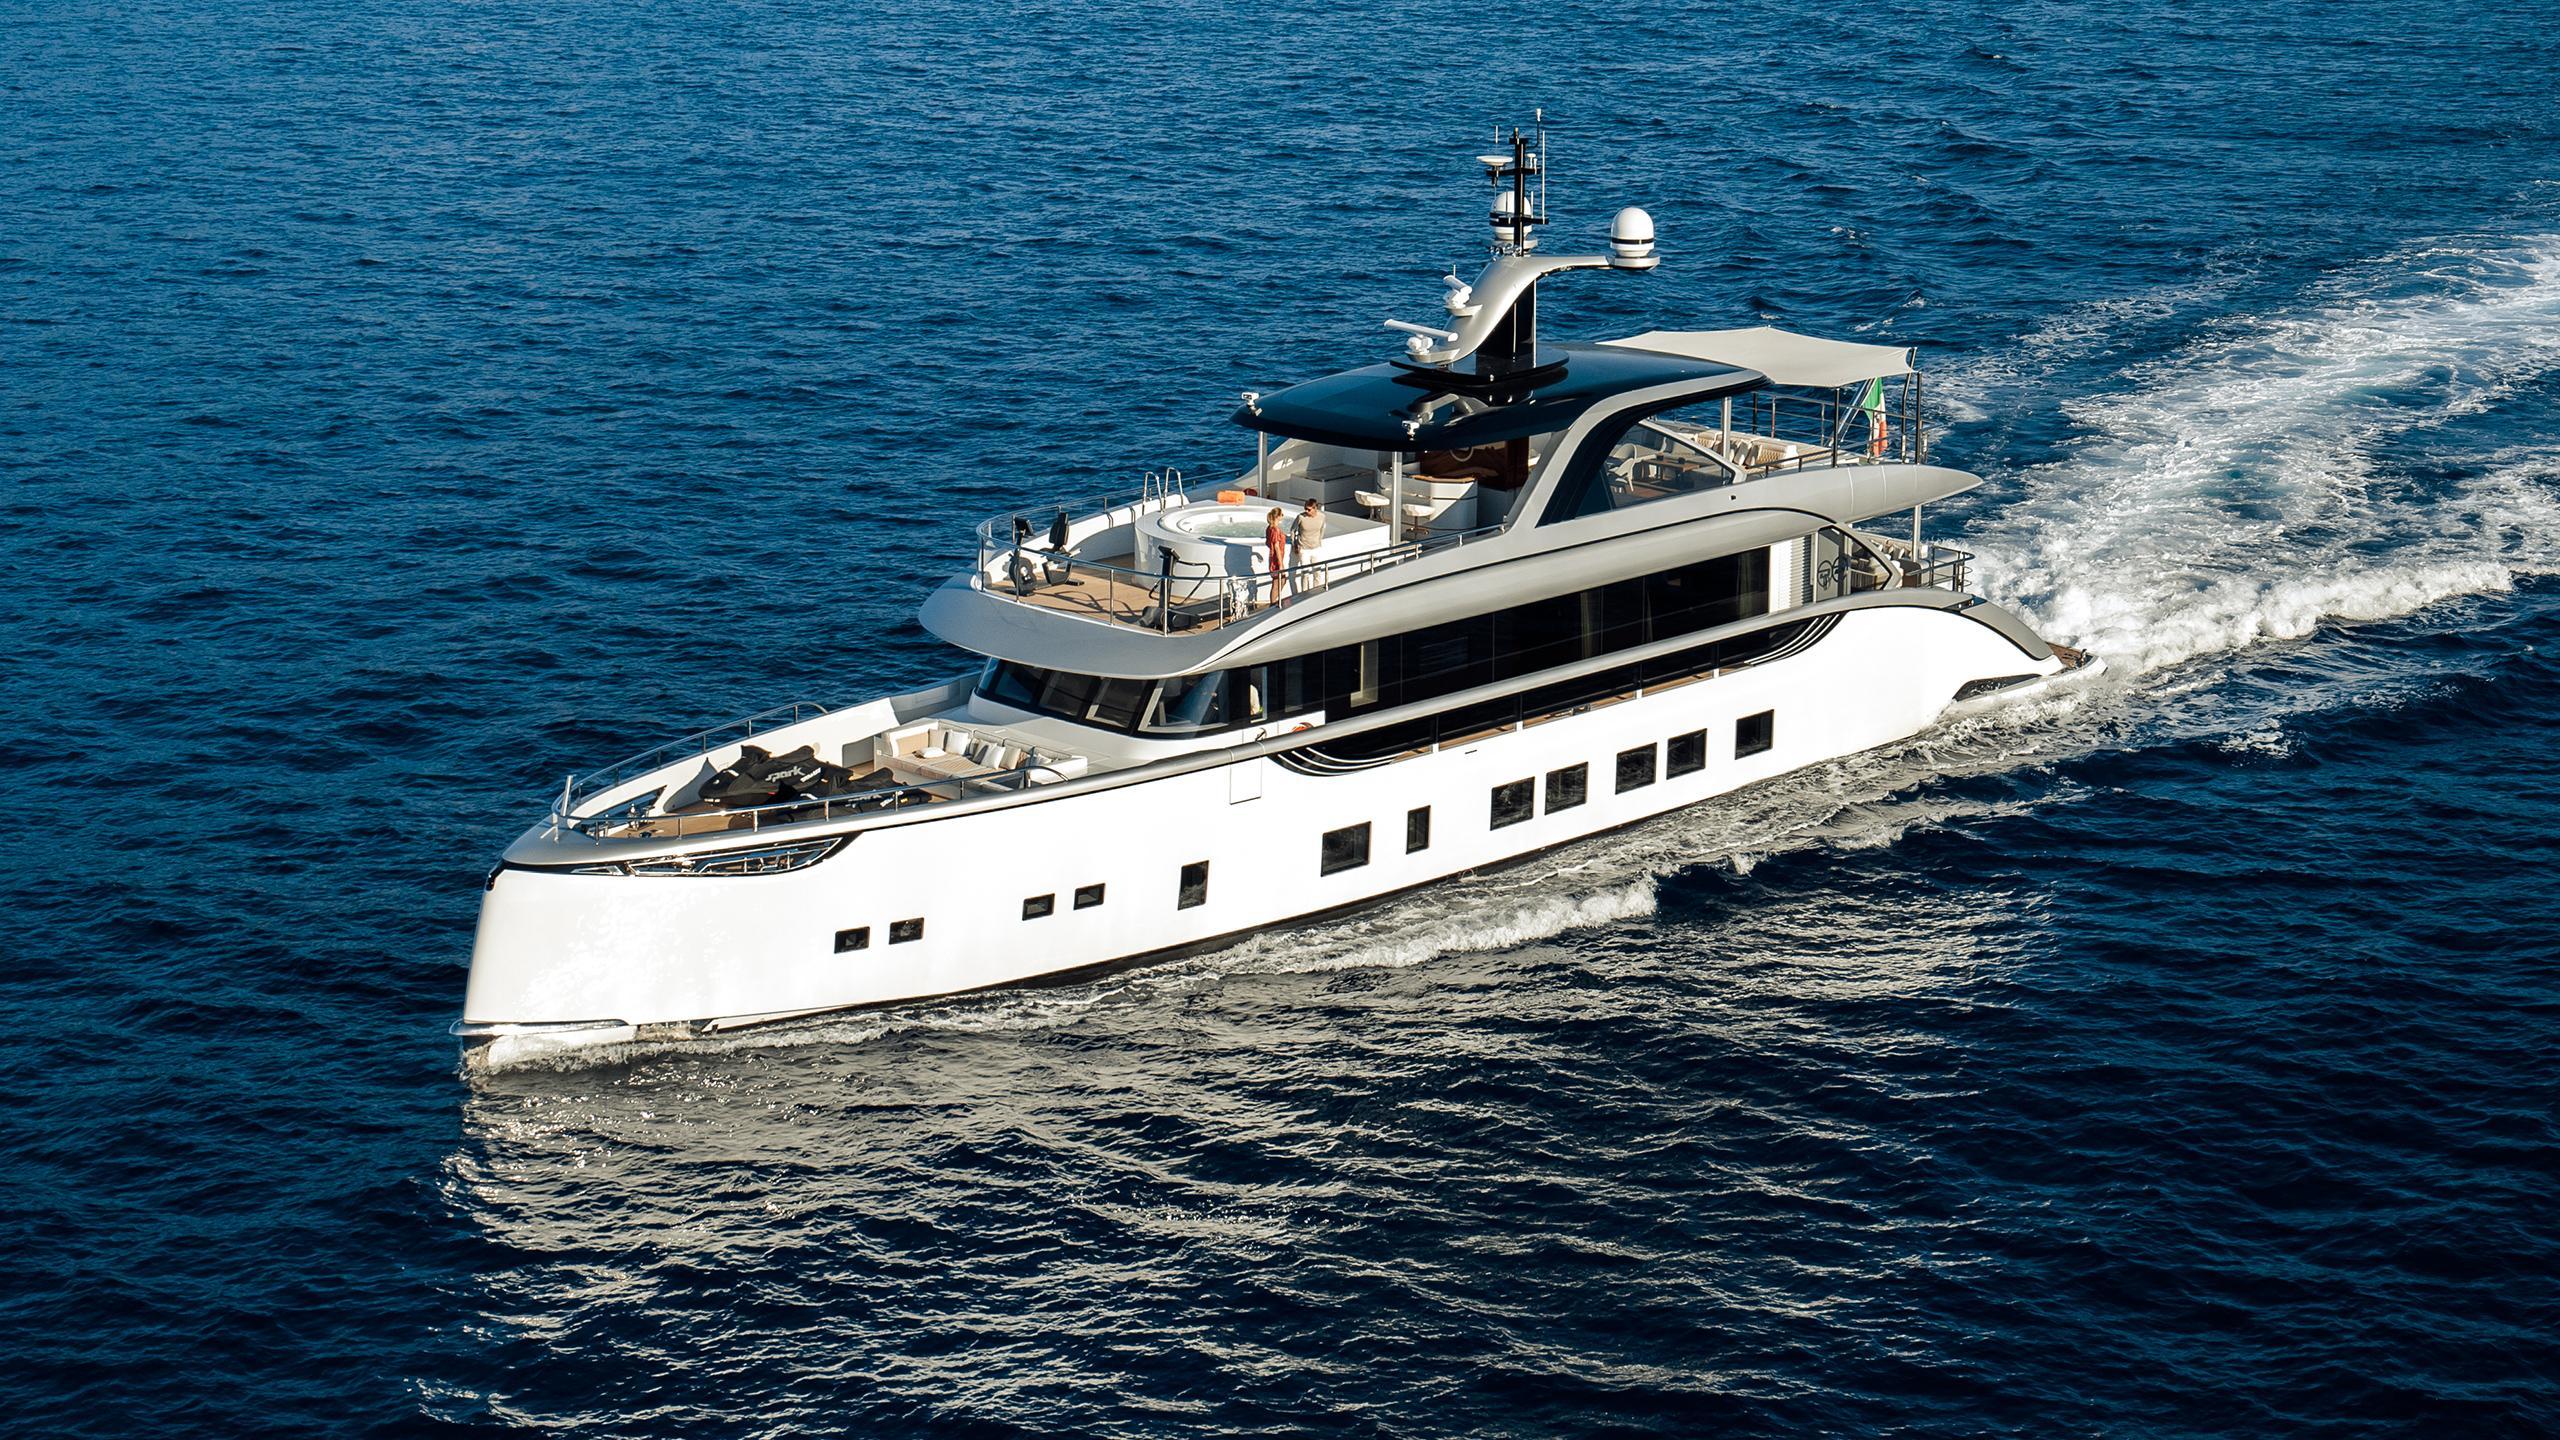 jetsetter motoryacht dynamiq yachts 39m 2016 cruising